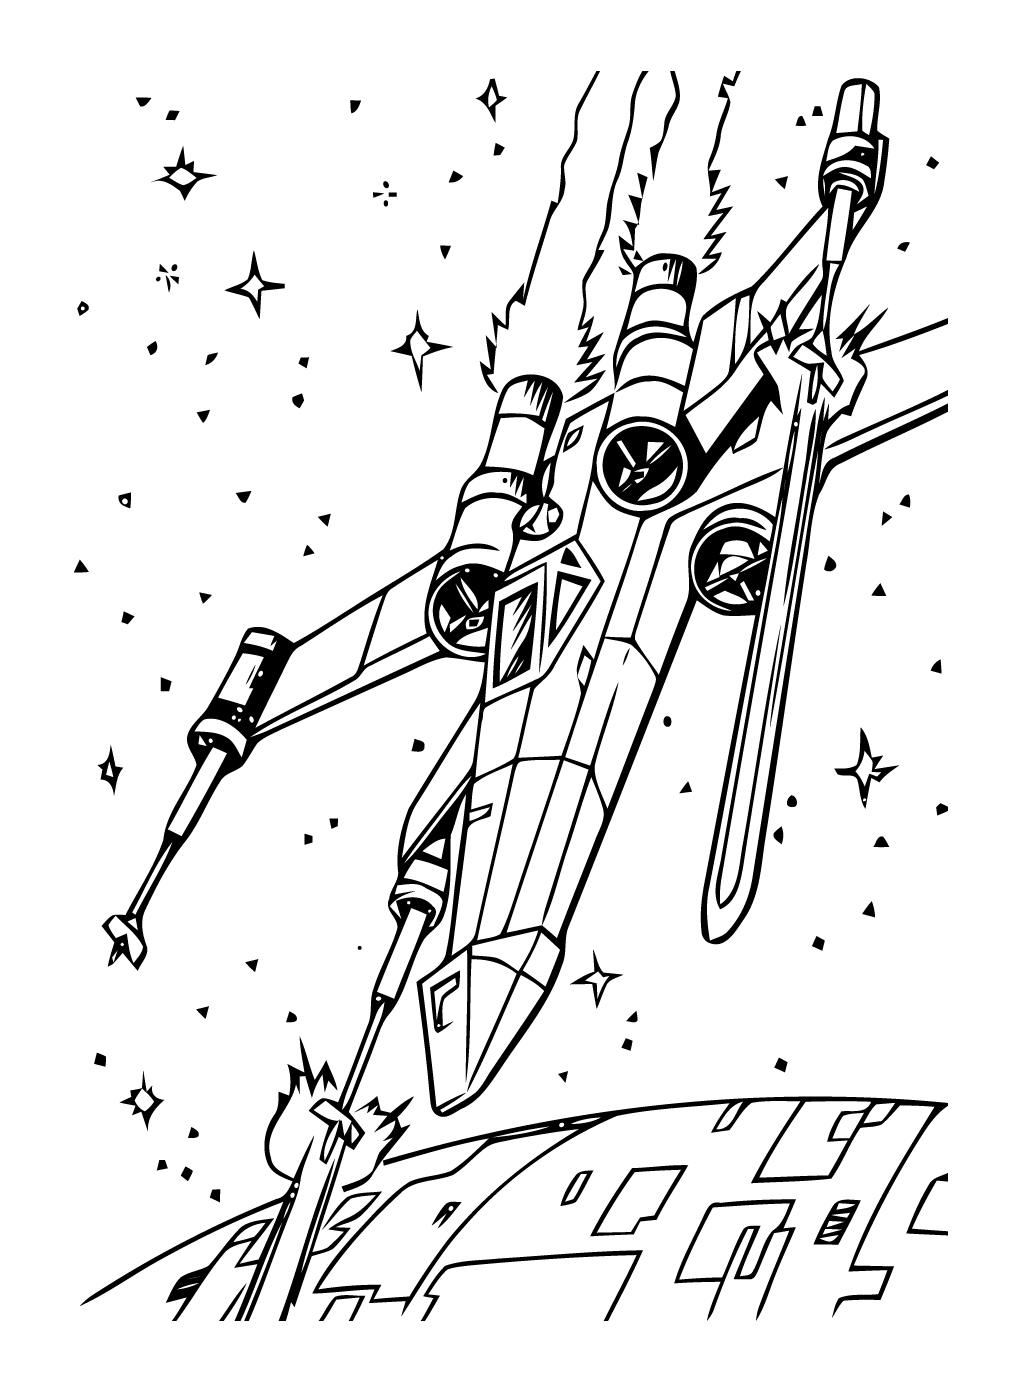 Dessin colorier star wars droide - Coloriage star wars yoda ...